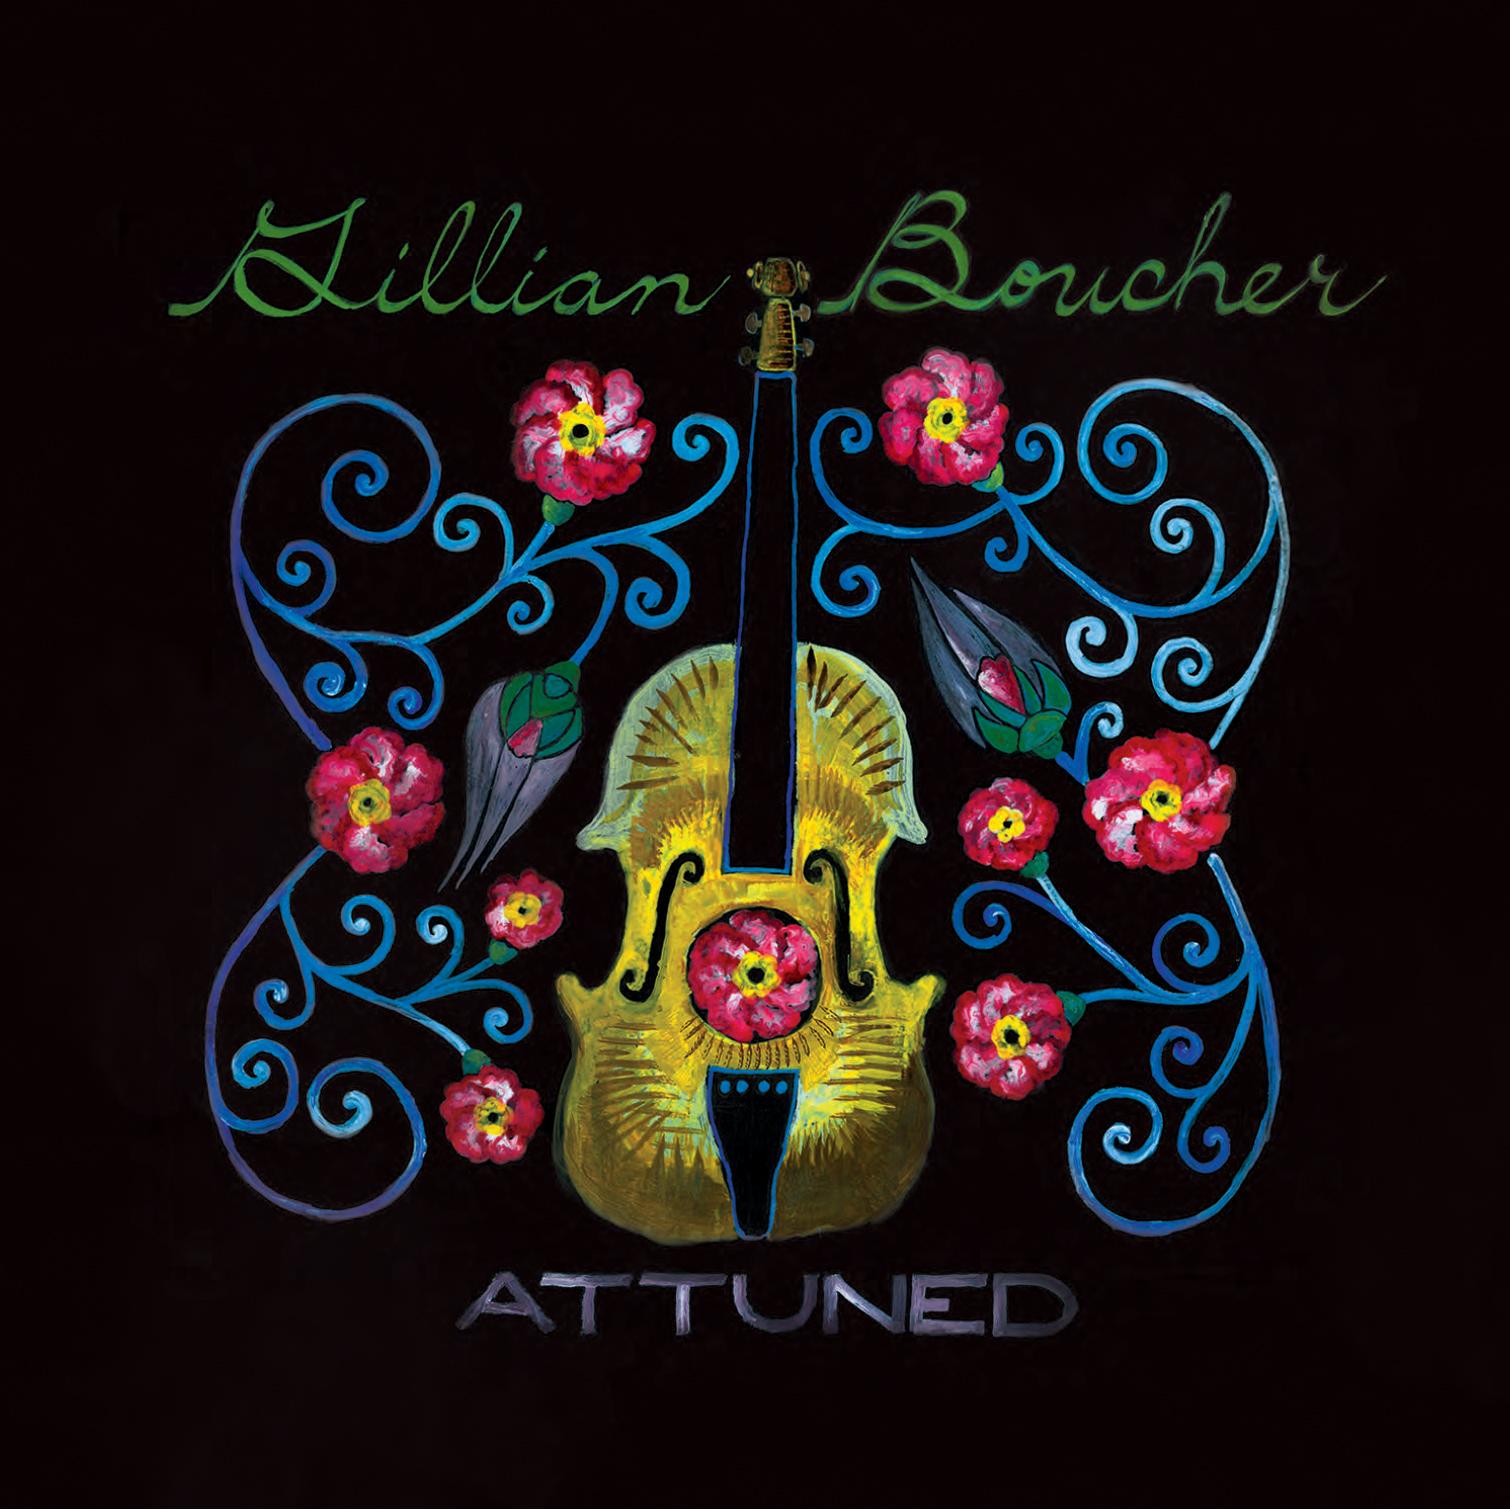 gillian boucher_Attuned-Album-Cover.jpg